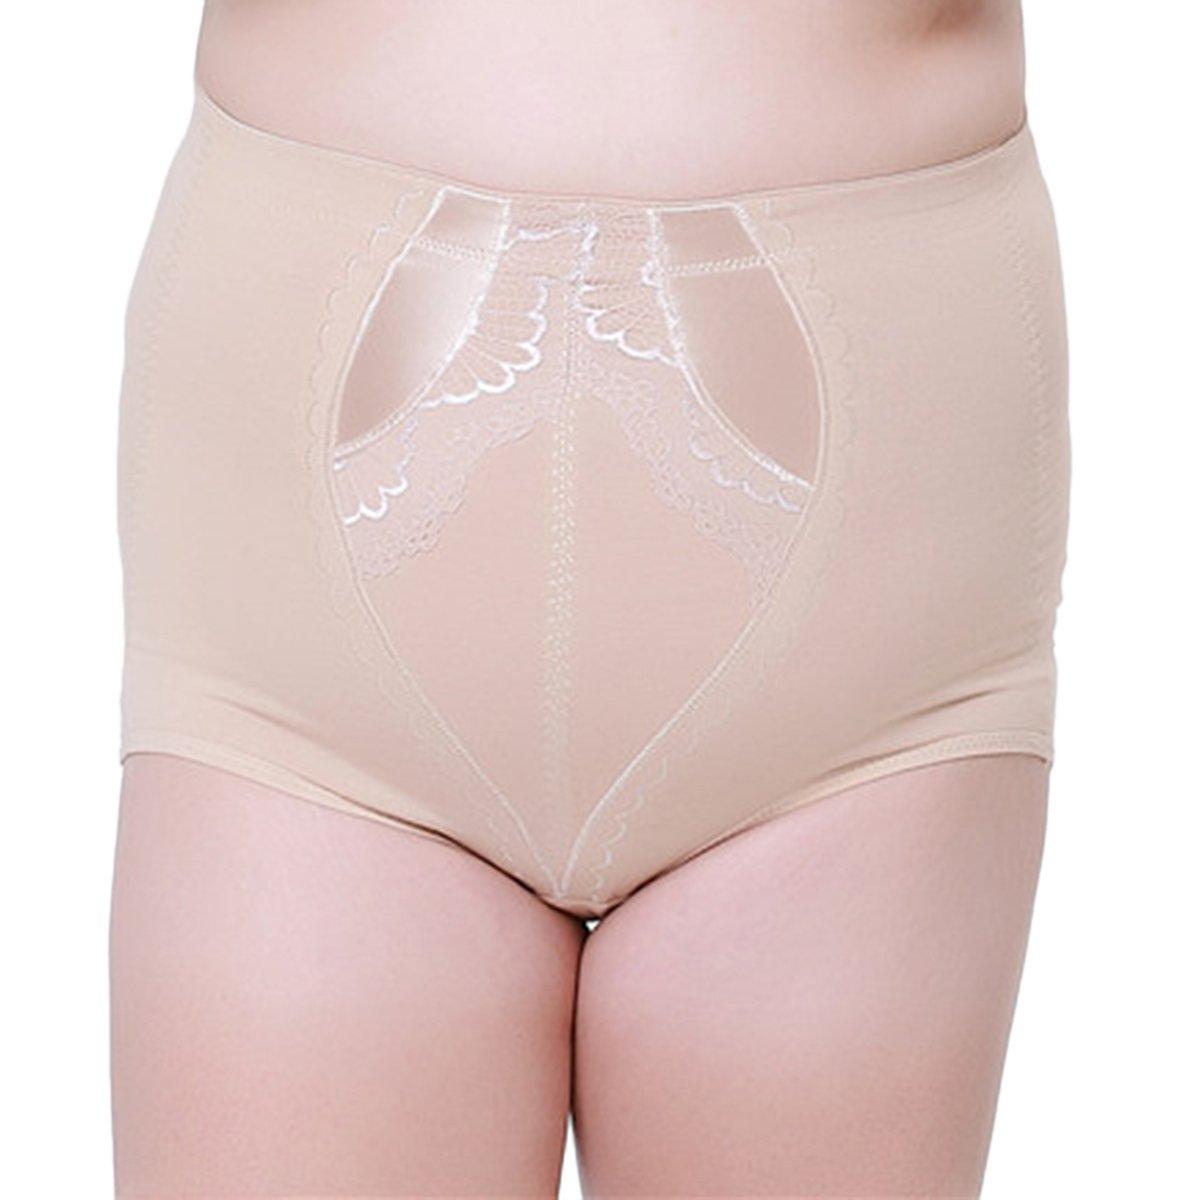 Niyatree Womens Cotton Hi-Cut Boys Shorts Tummy Control Panties Shapewear Brief